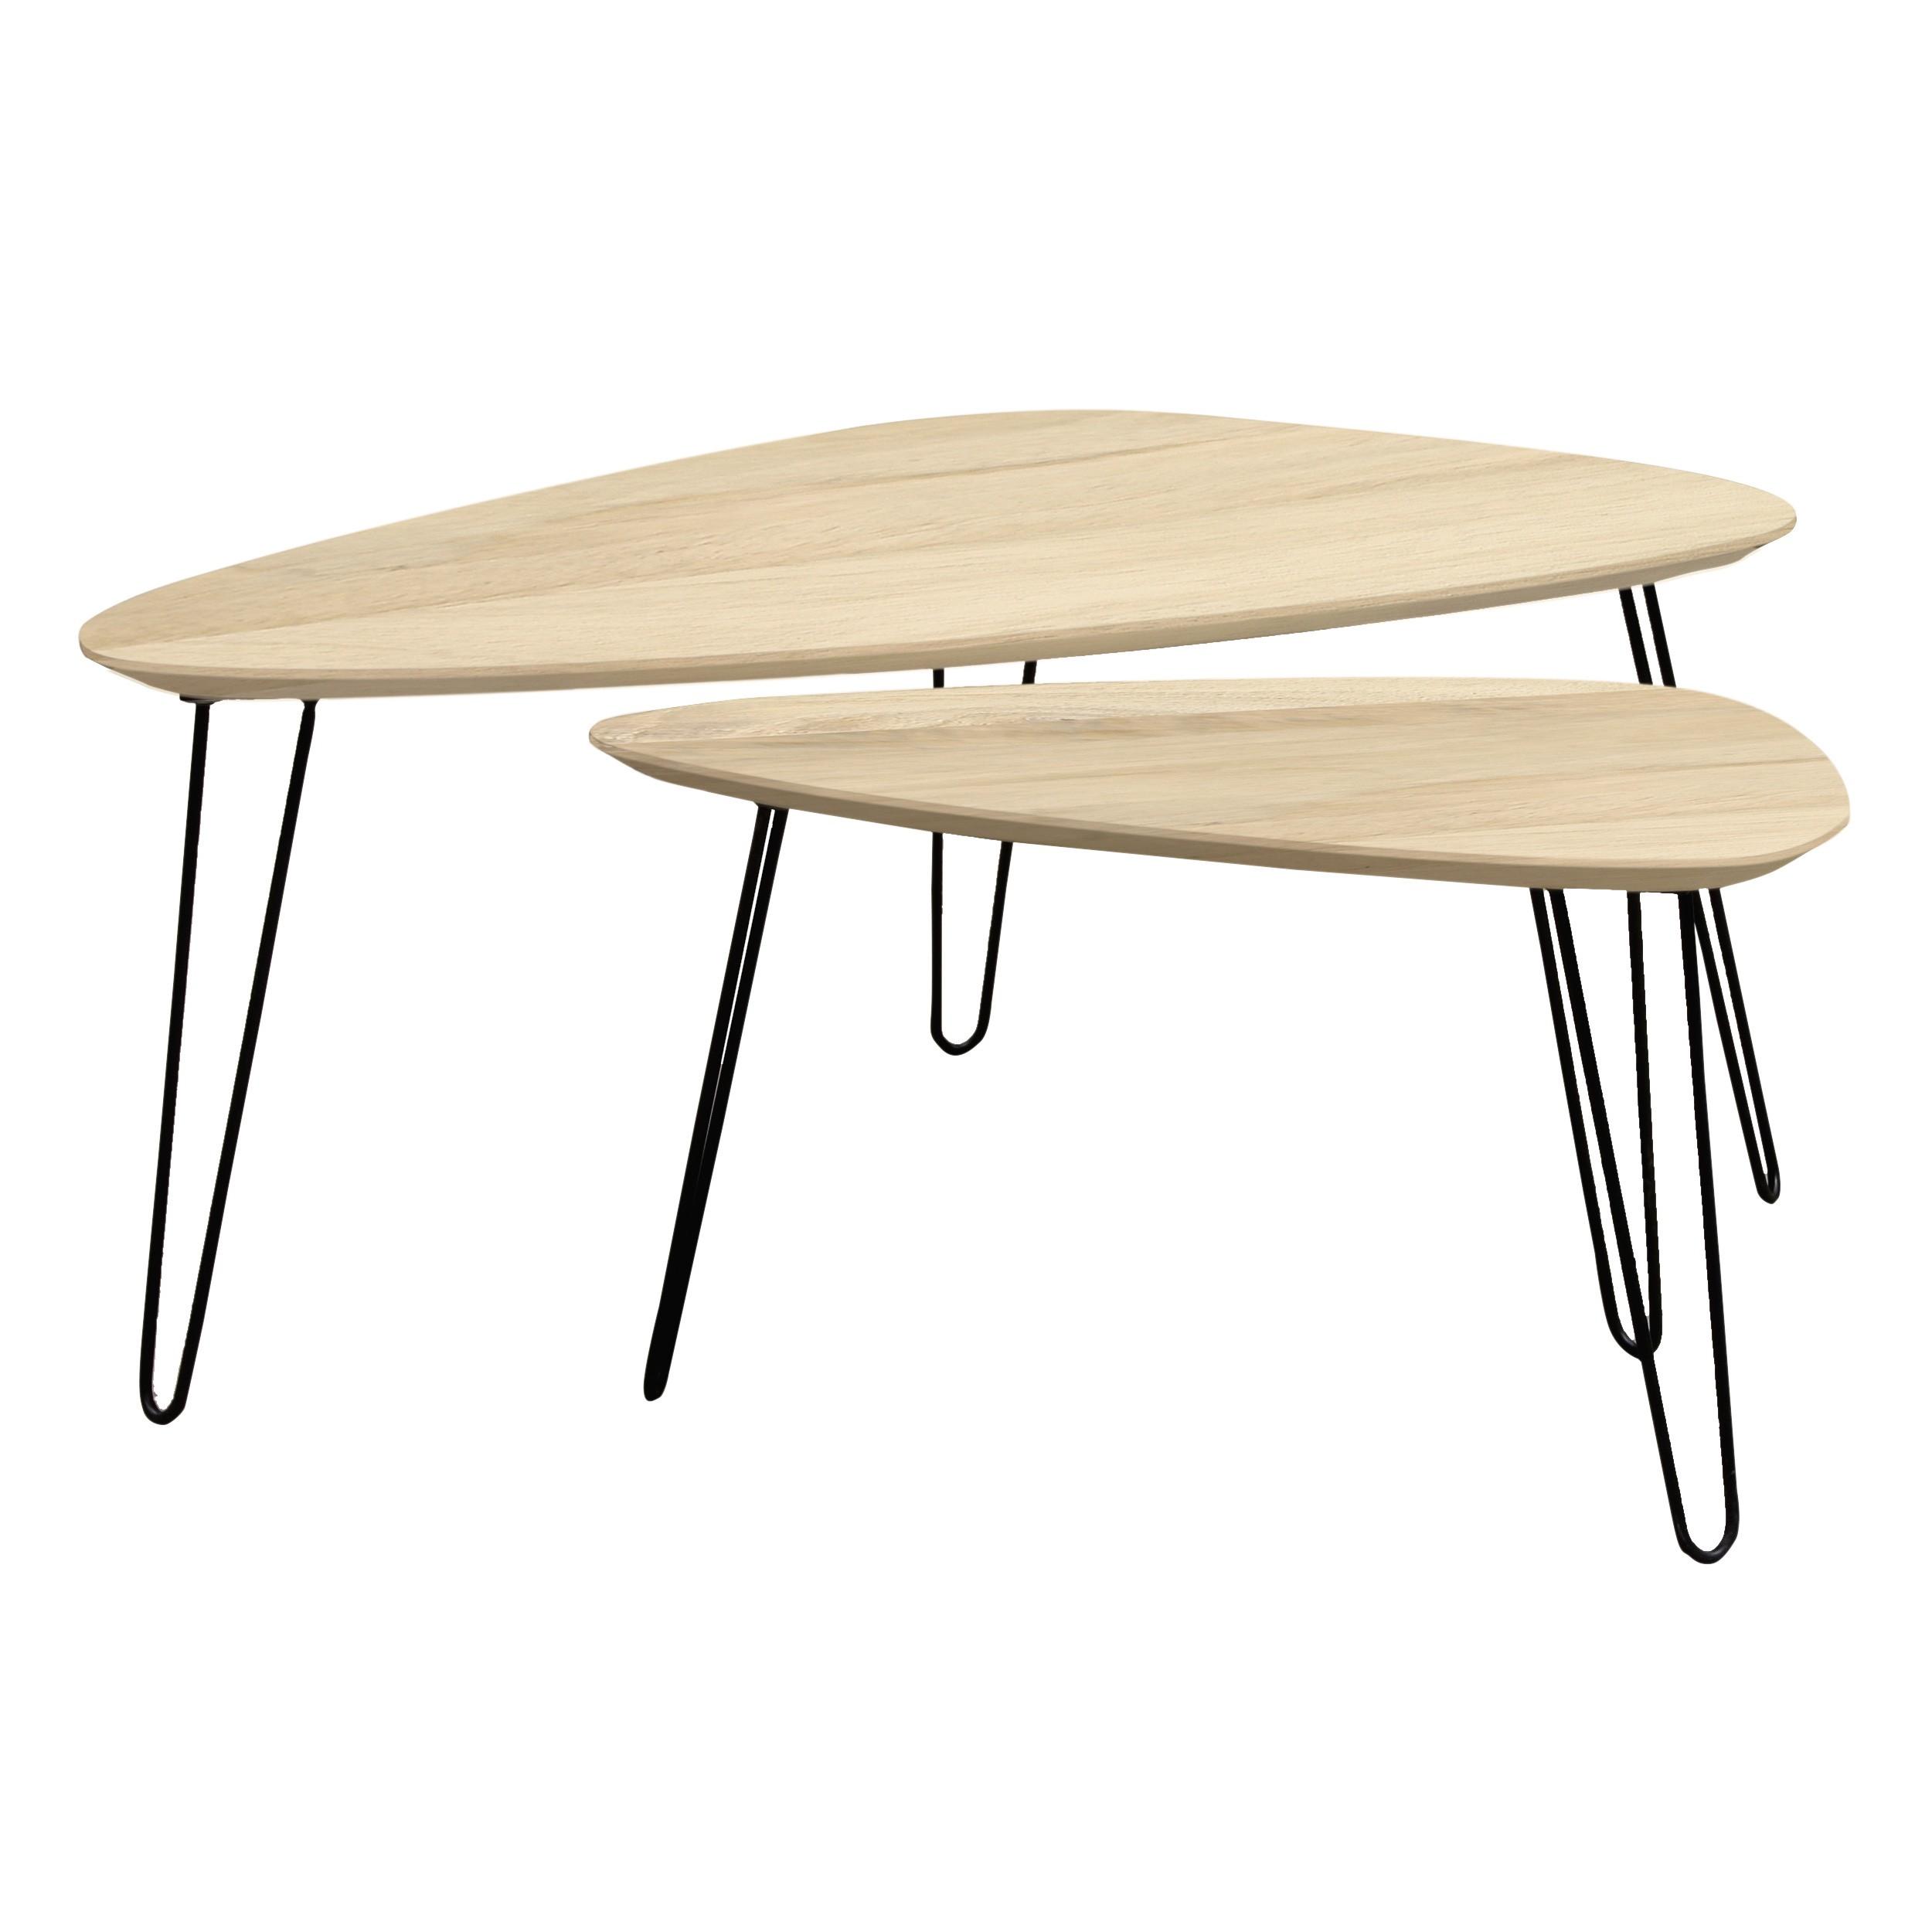 tables basses gigognes scandinaves riga lot de 2 achetez les tables basses gigognes. Black Bedroom Furniture Sets. Home Design Ideas